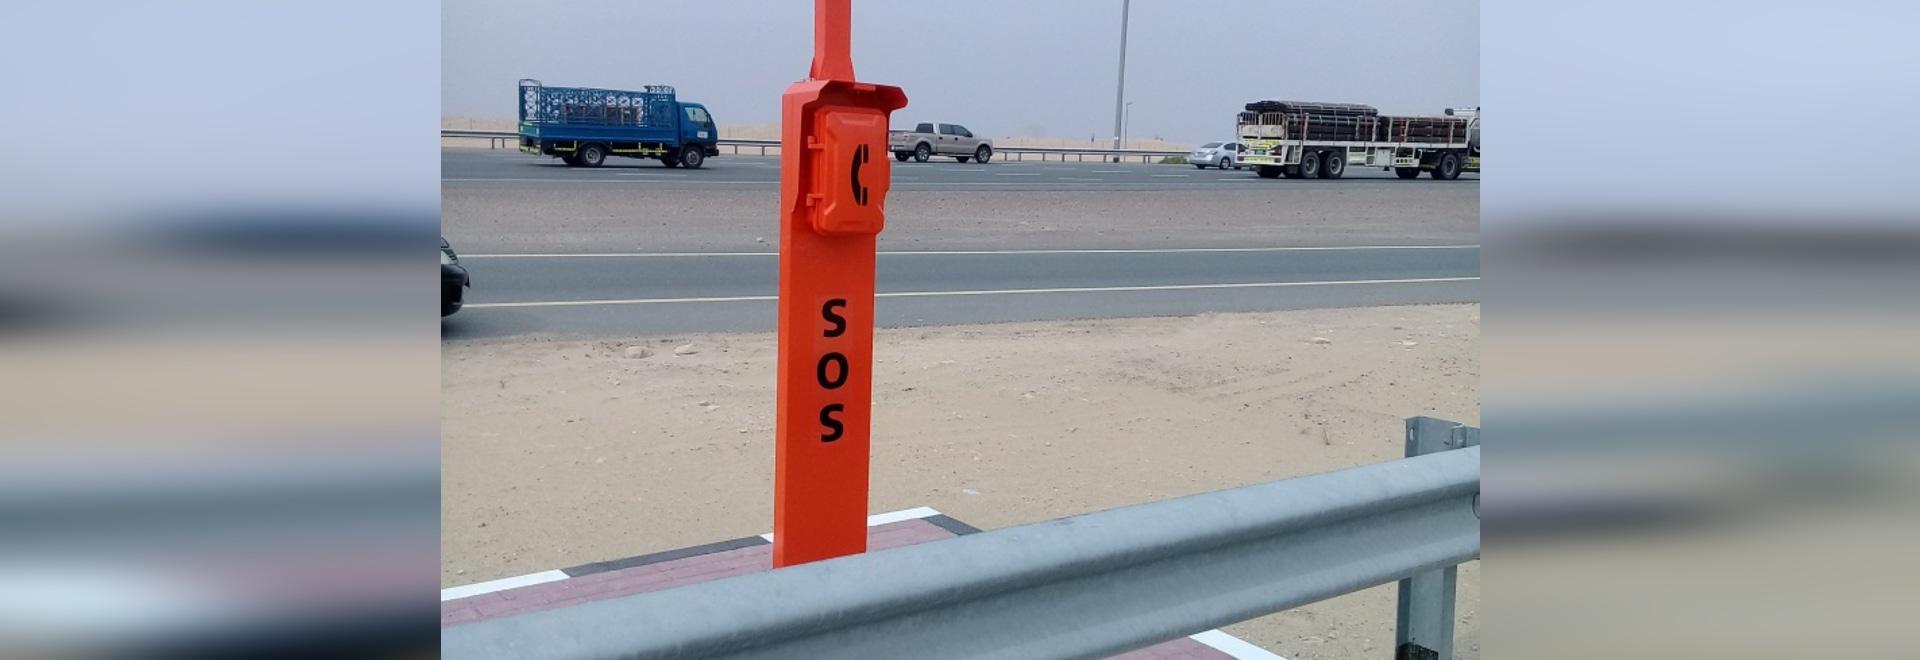 Neues Entwurfs-Notstraßenrand-Telefon für Dubai-Landstraßen-Projekt